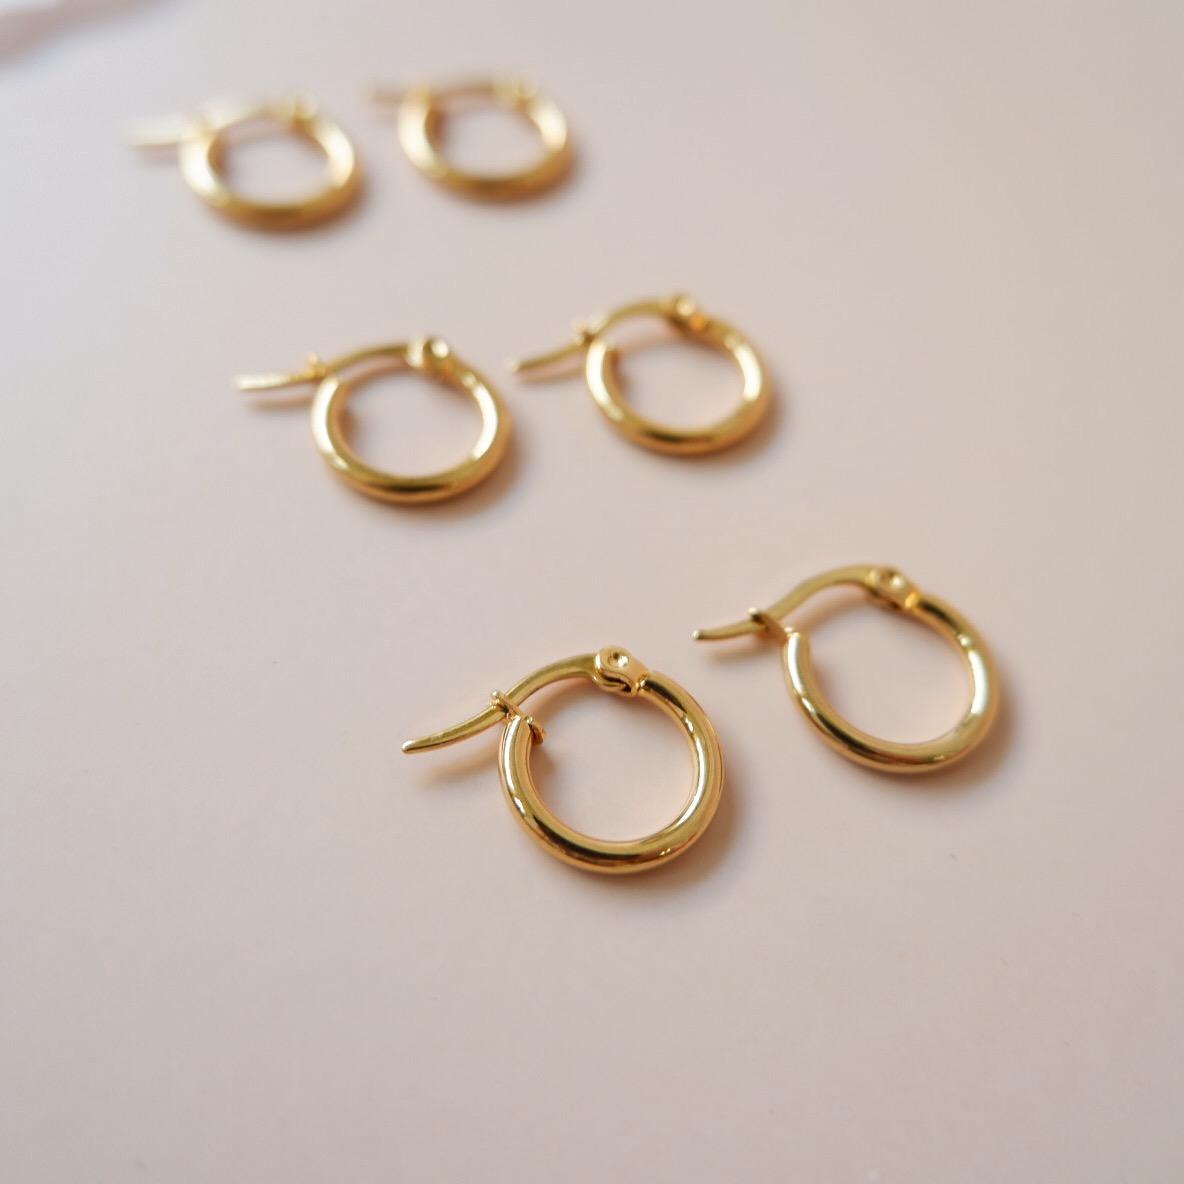 Sia Small Earrings – Image 2